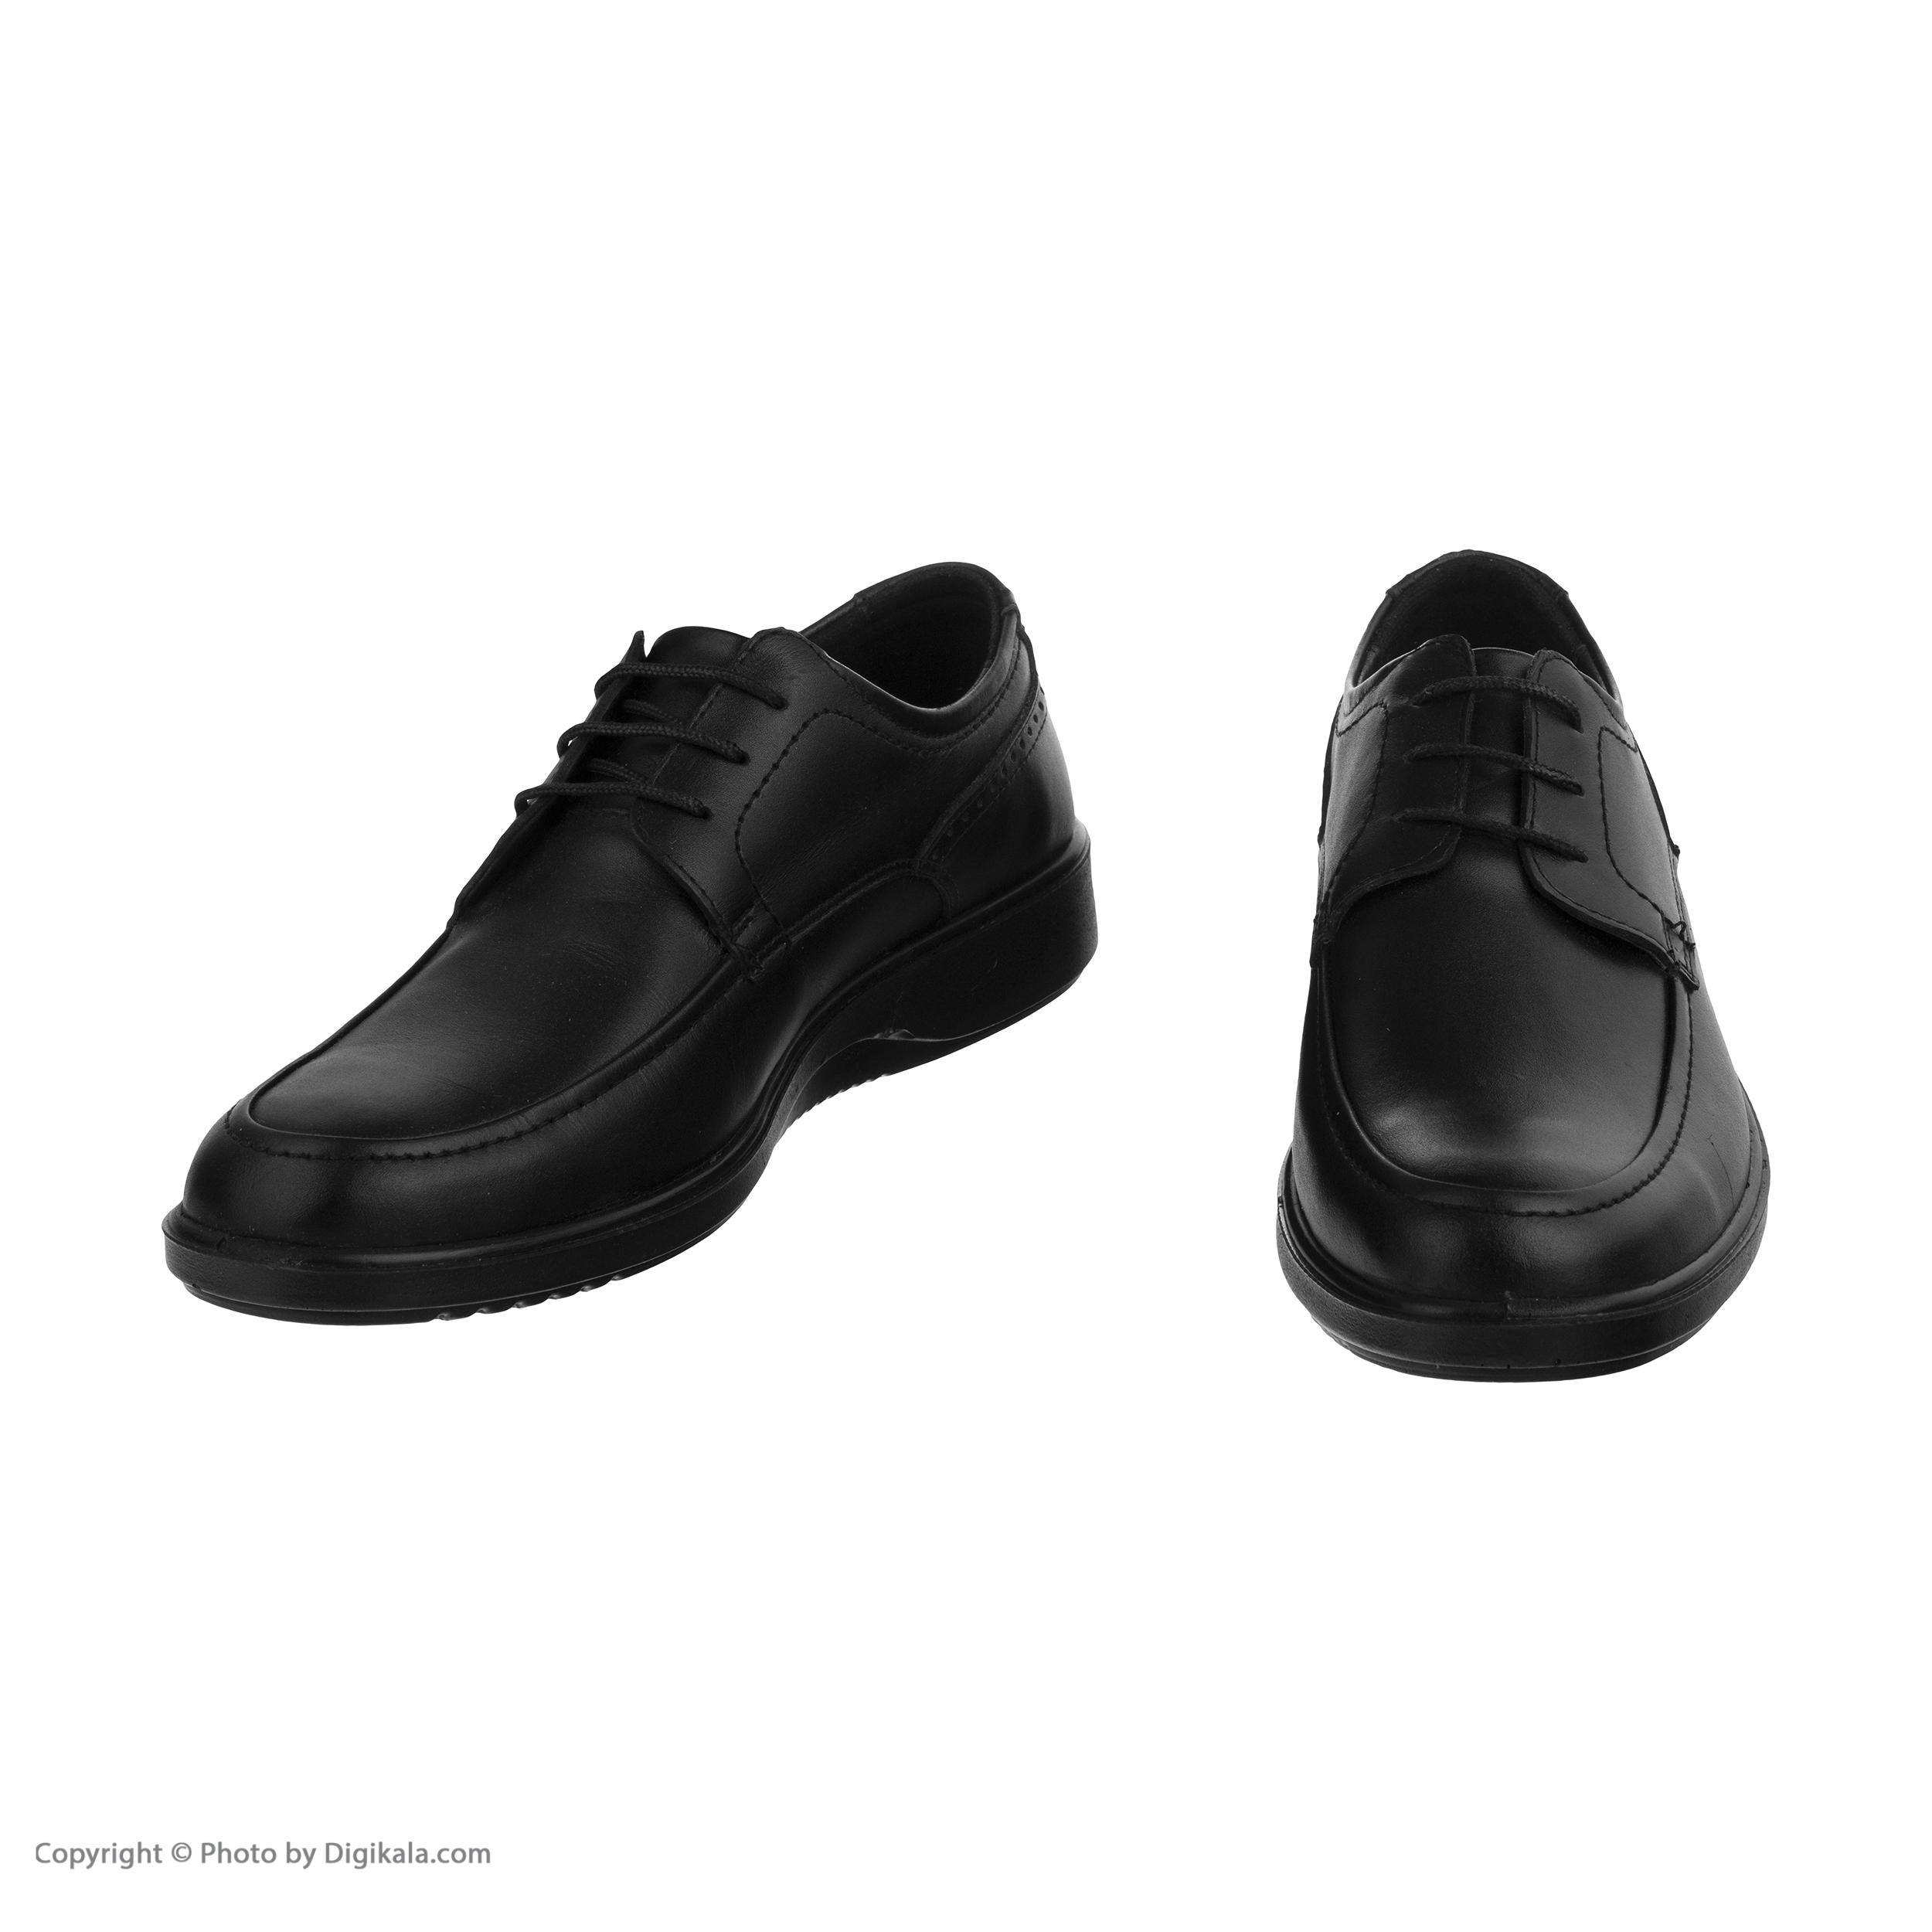 کفش روزمره مردانه سوته مدل 4994E503101 -  - 8